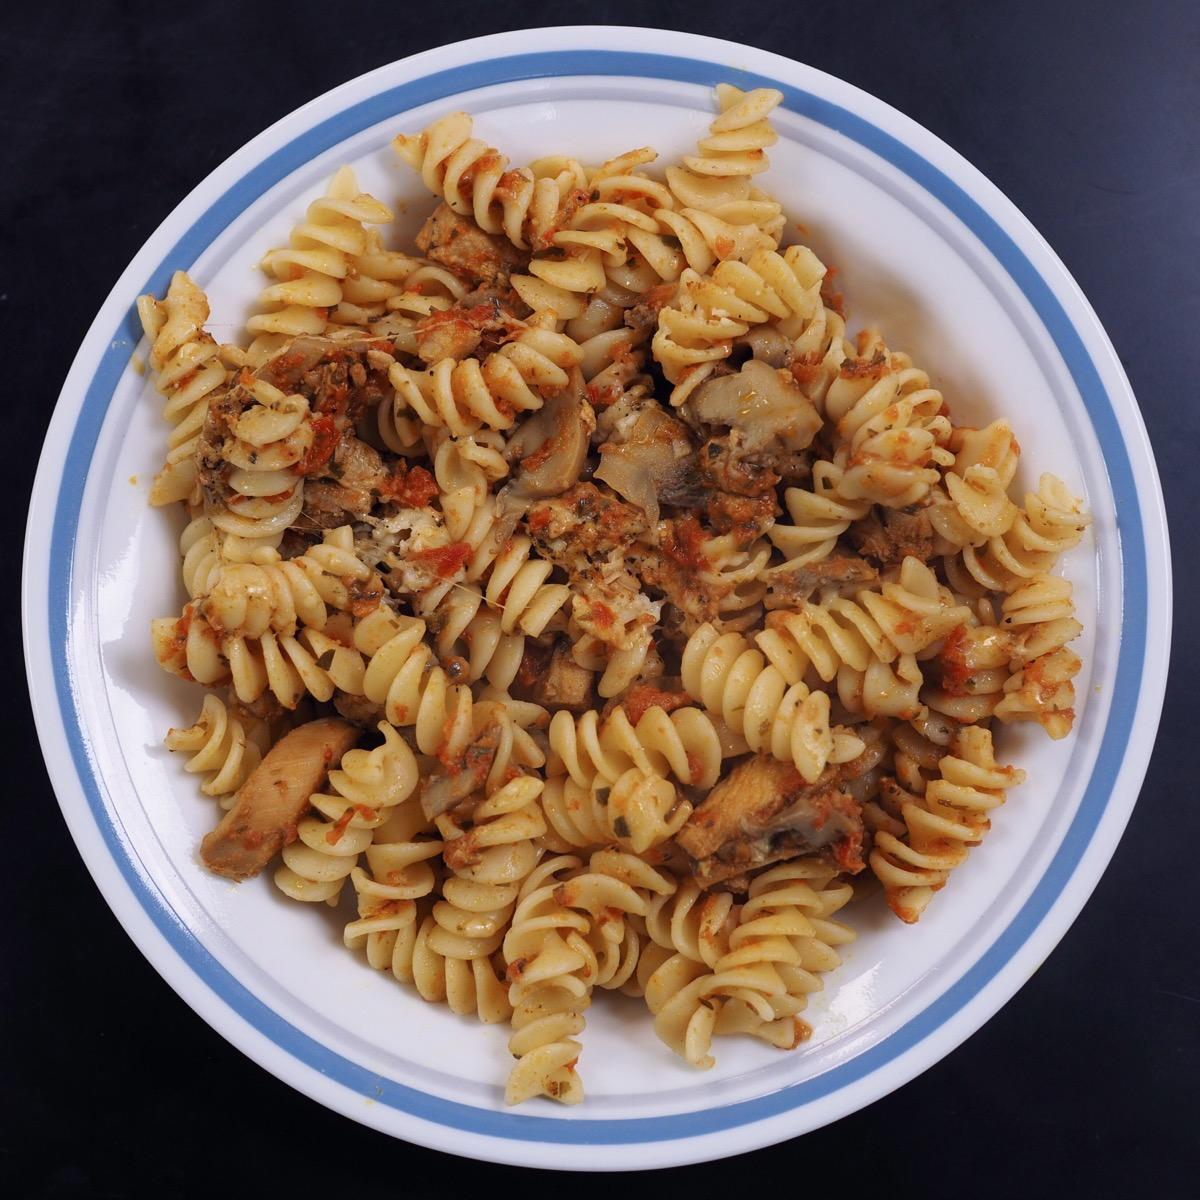 Tarragon pasta